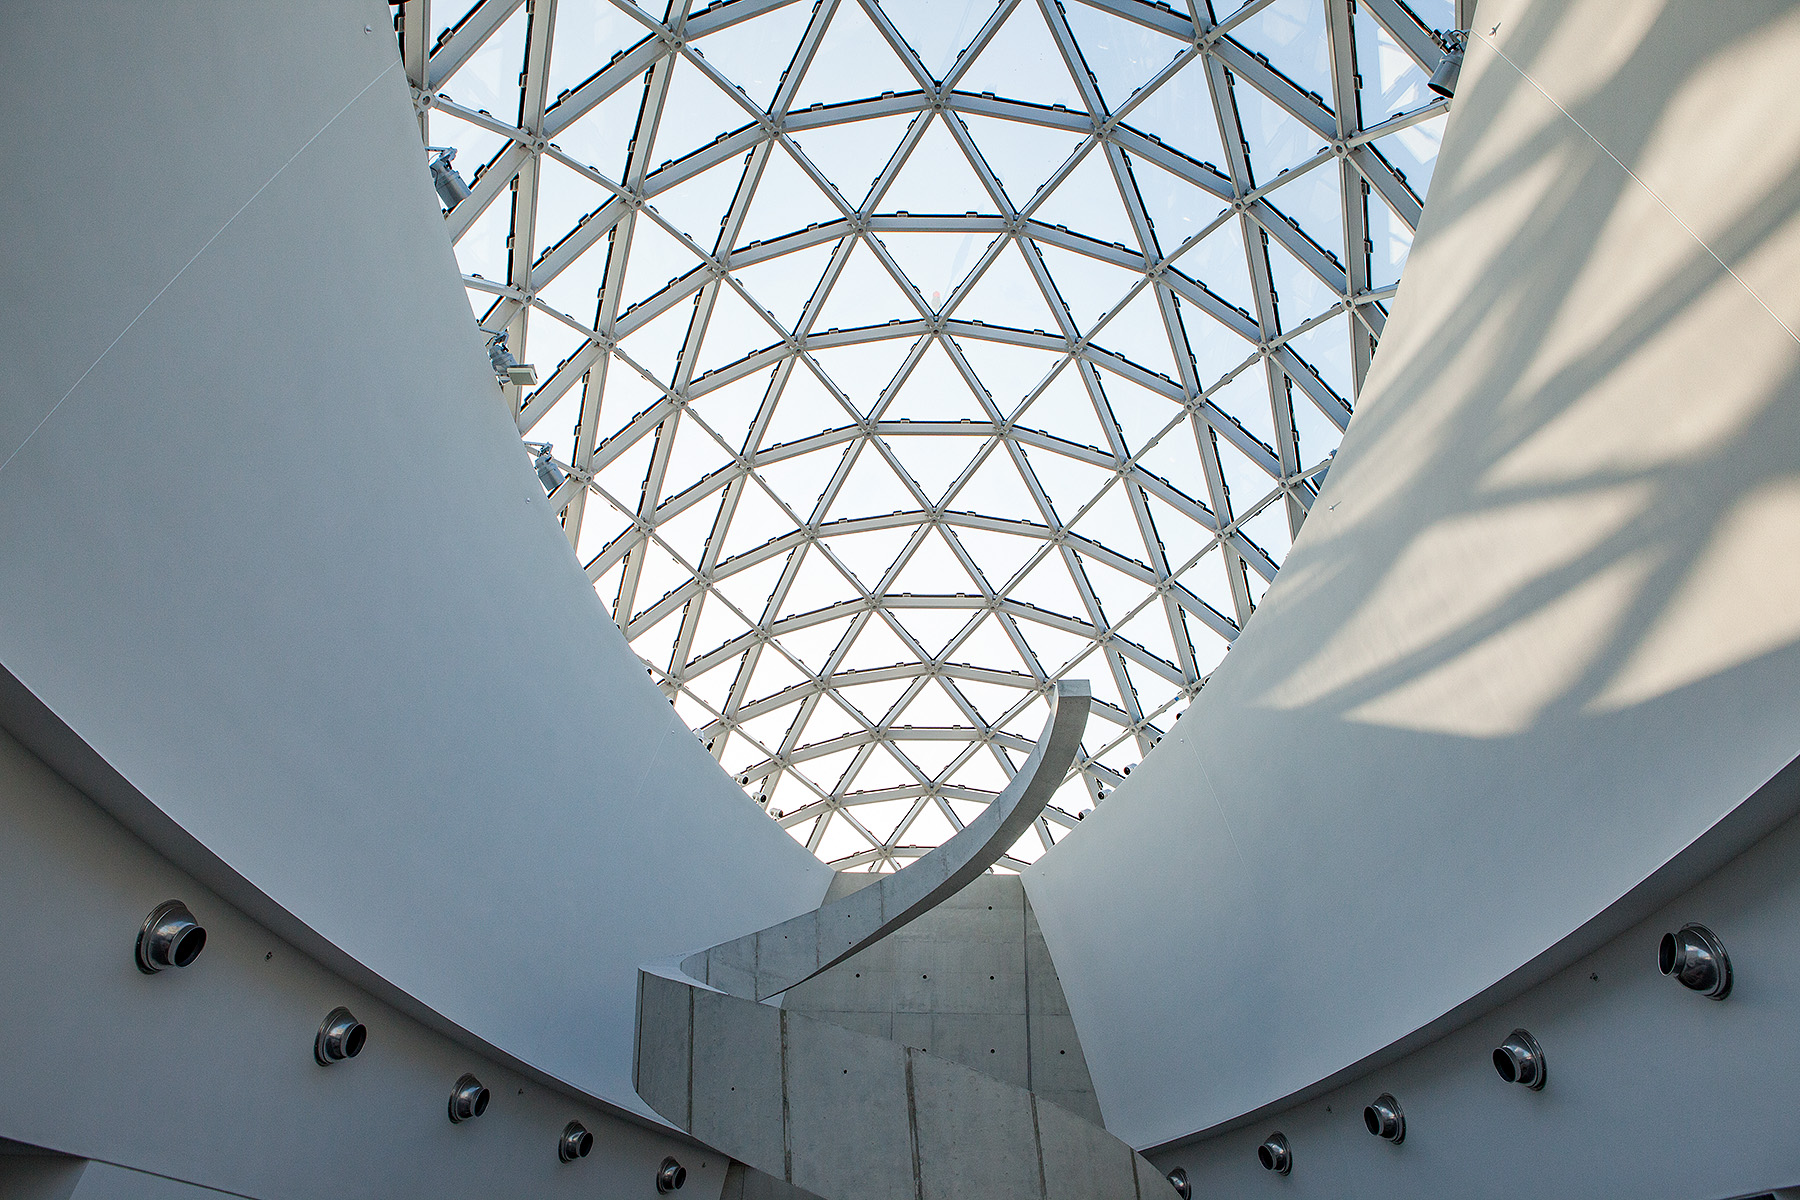 The Dali (Salvador Dali Museum)St. Petersburg, FLDesigned by HOK